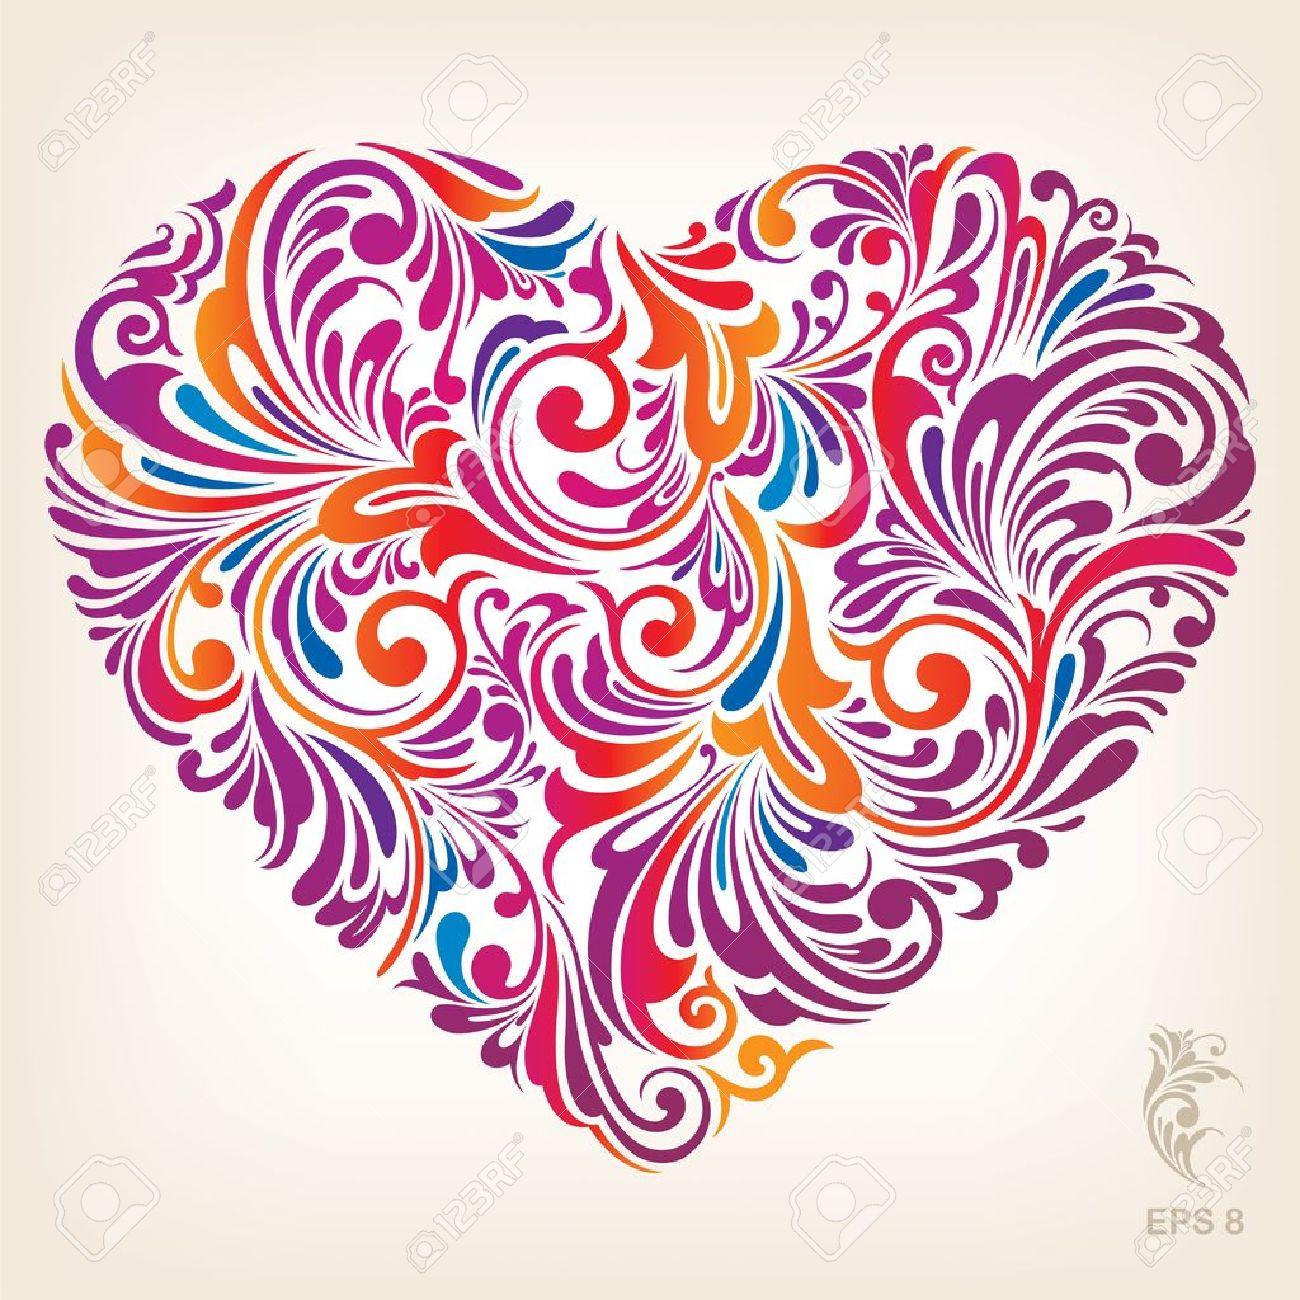 Ornamental Colored Heart Pattern Stock Vector - 12963945